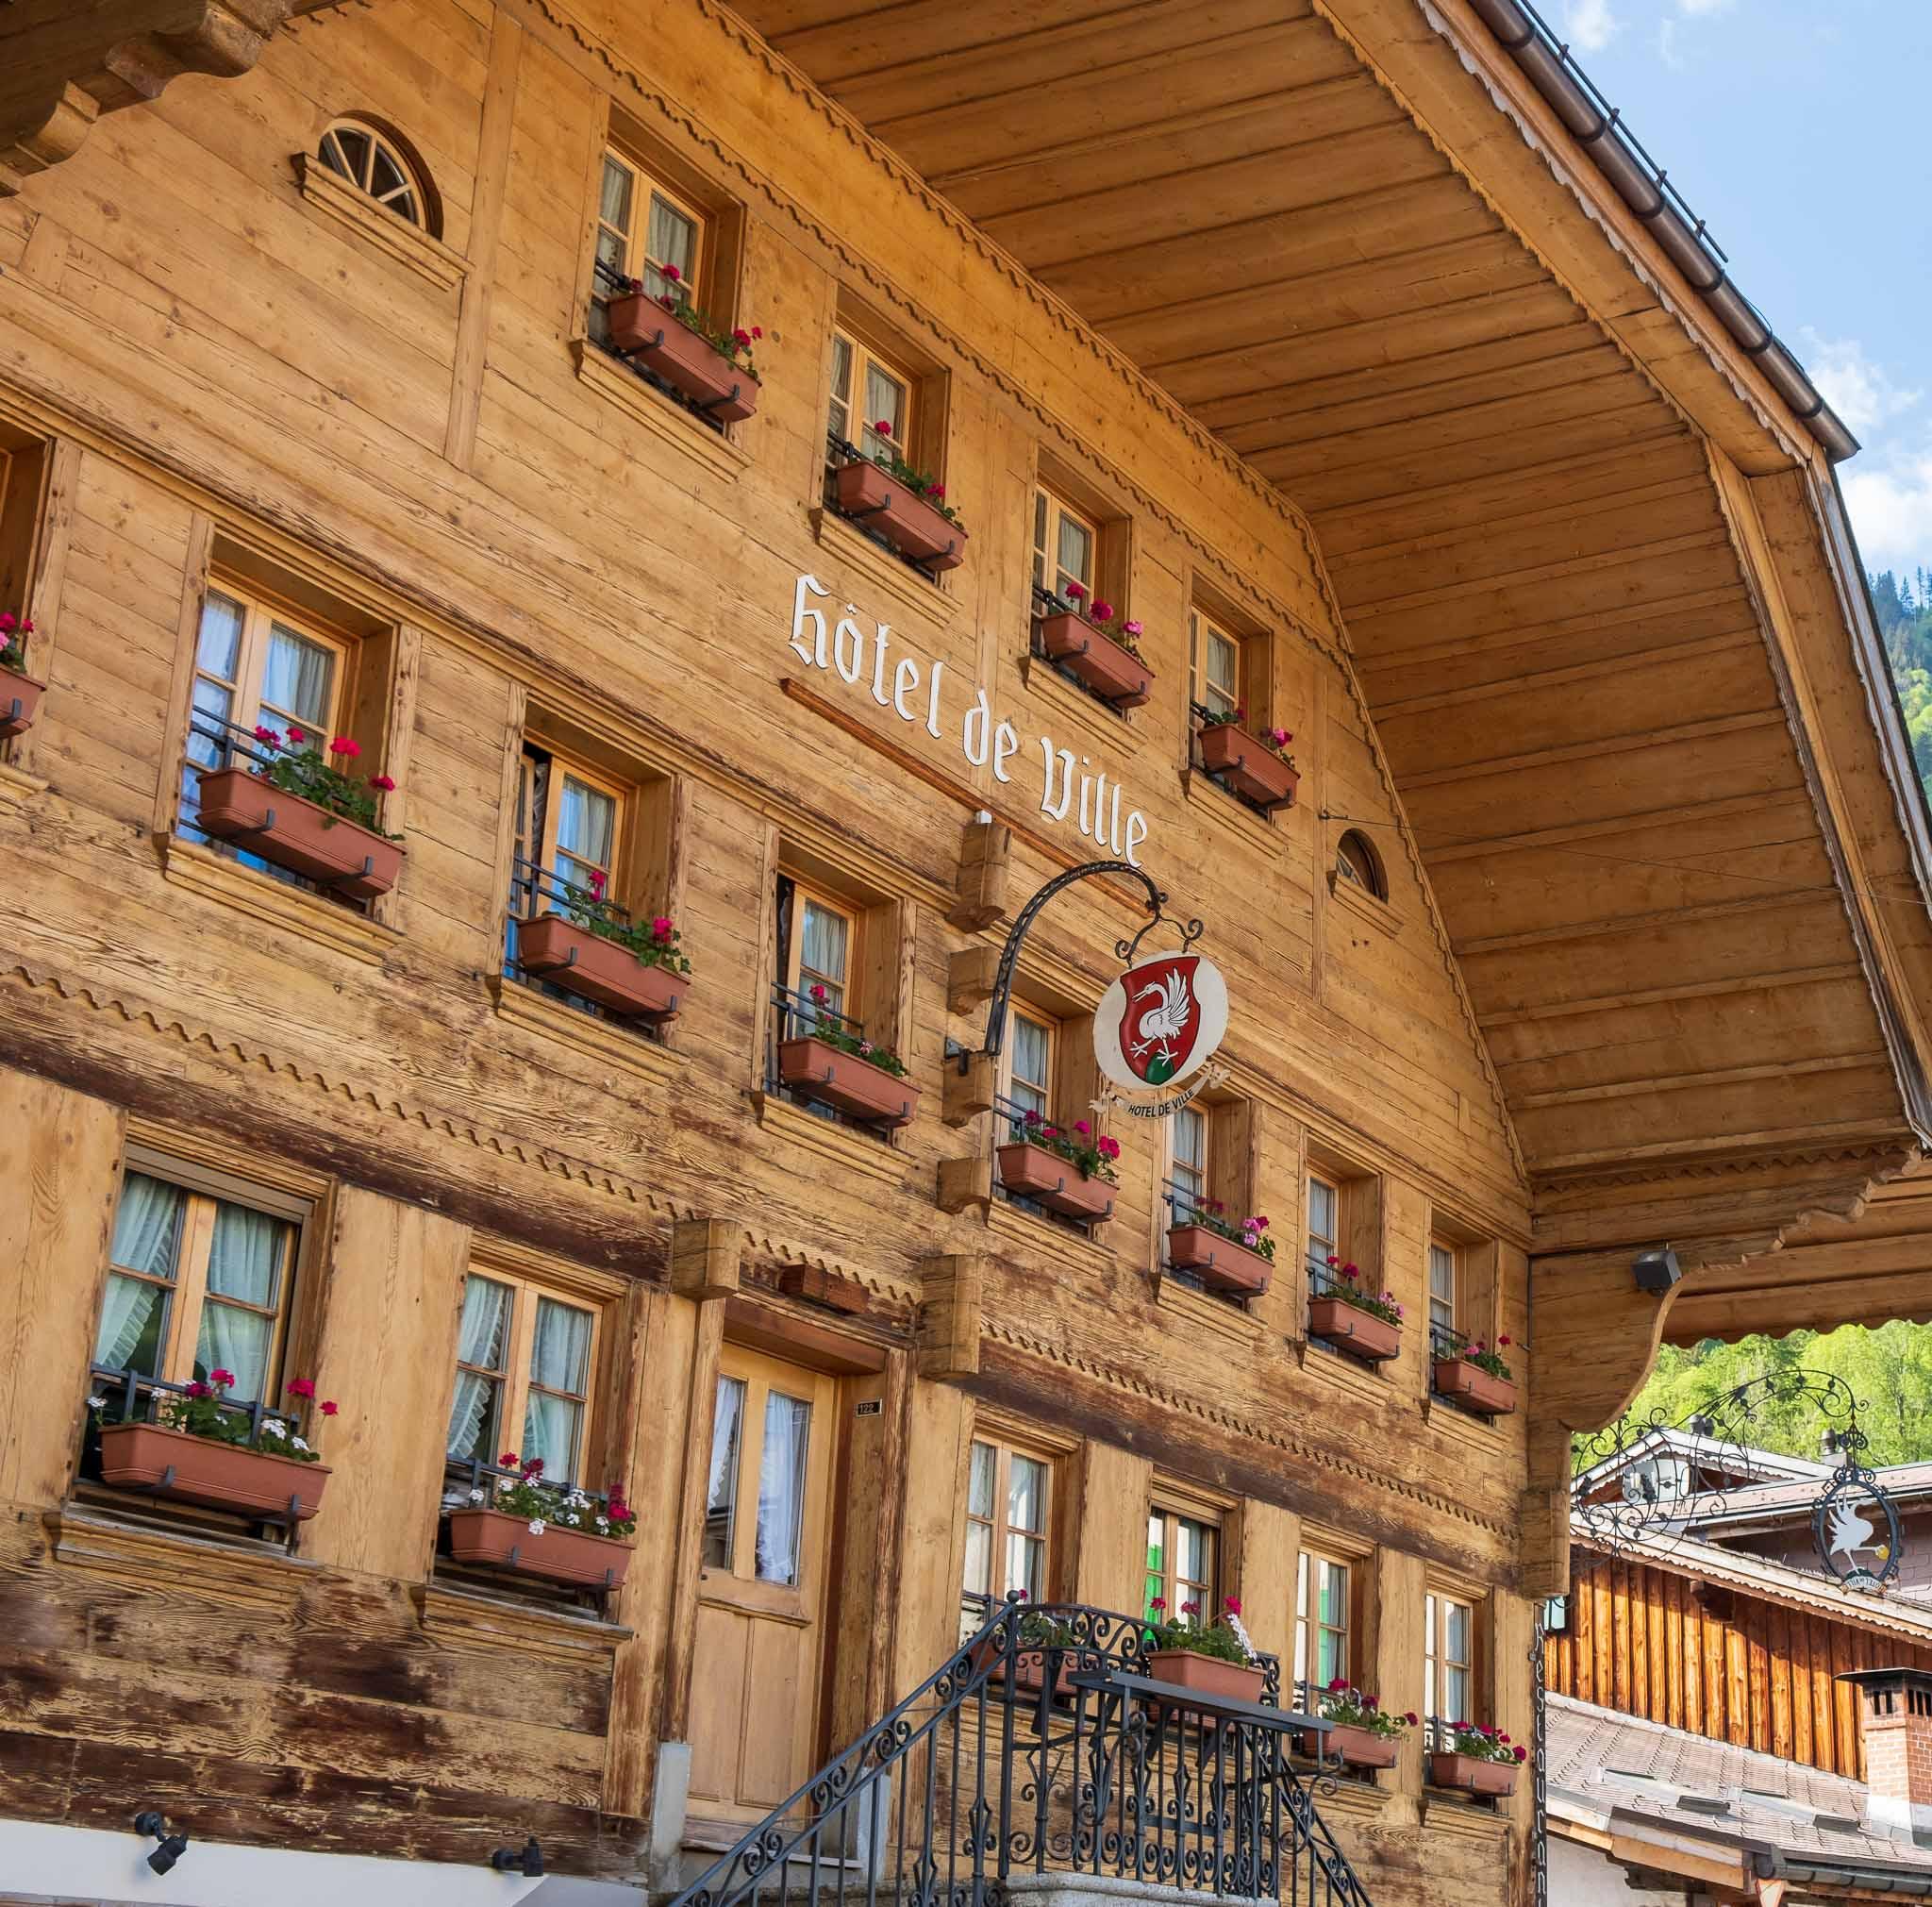 The Town Hall on Rossinière audio tour Cowbells, Chalets and Balthus: A Swiss Alpine Village Excursion